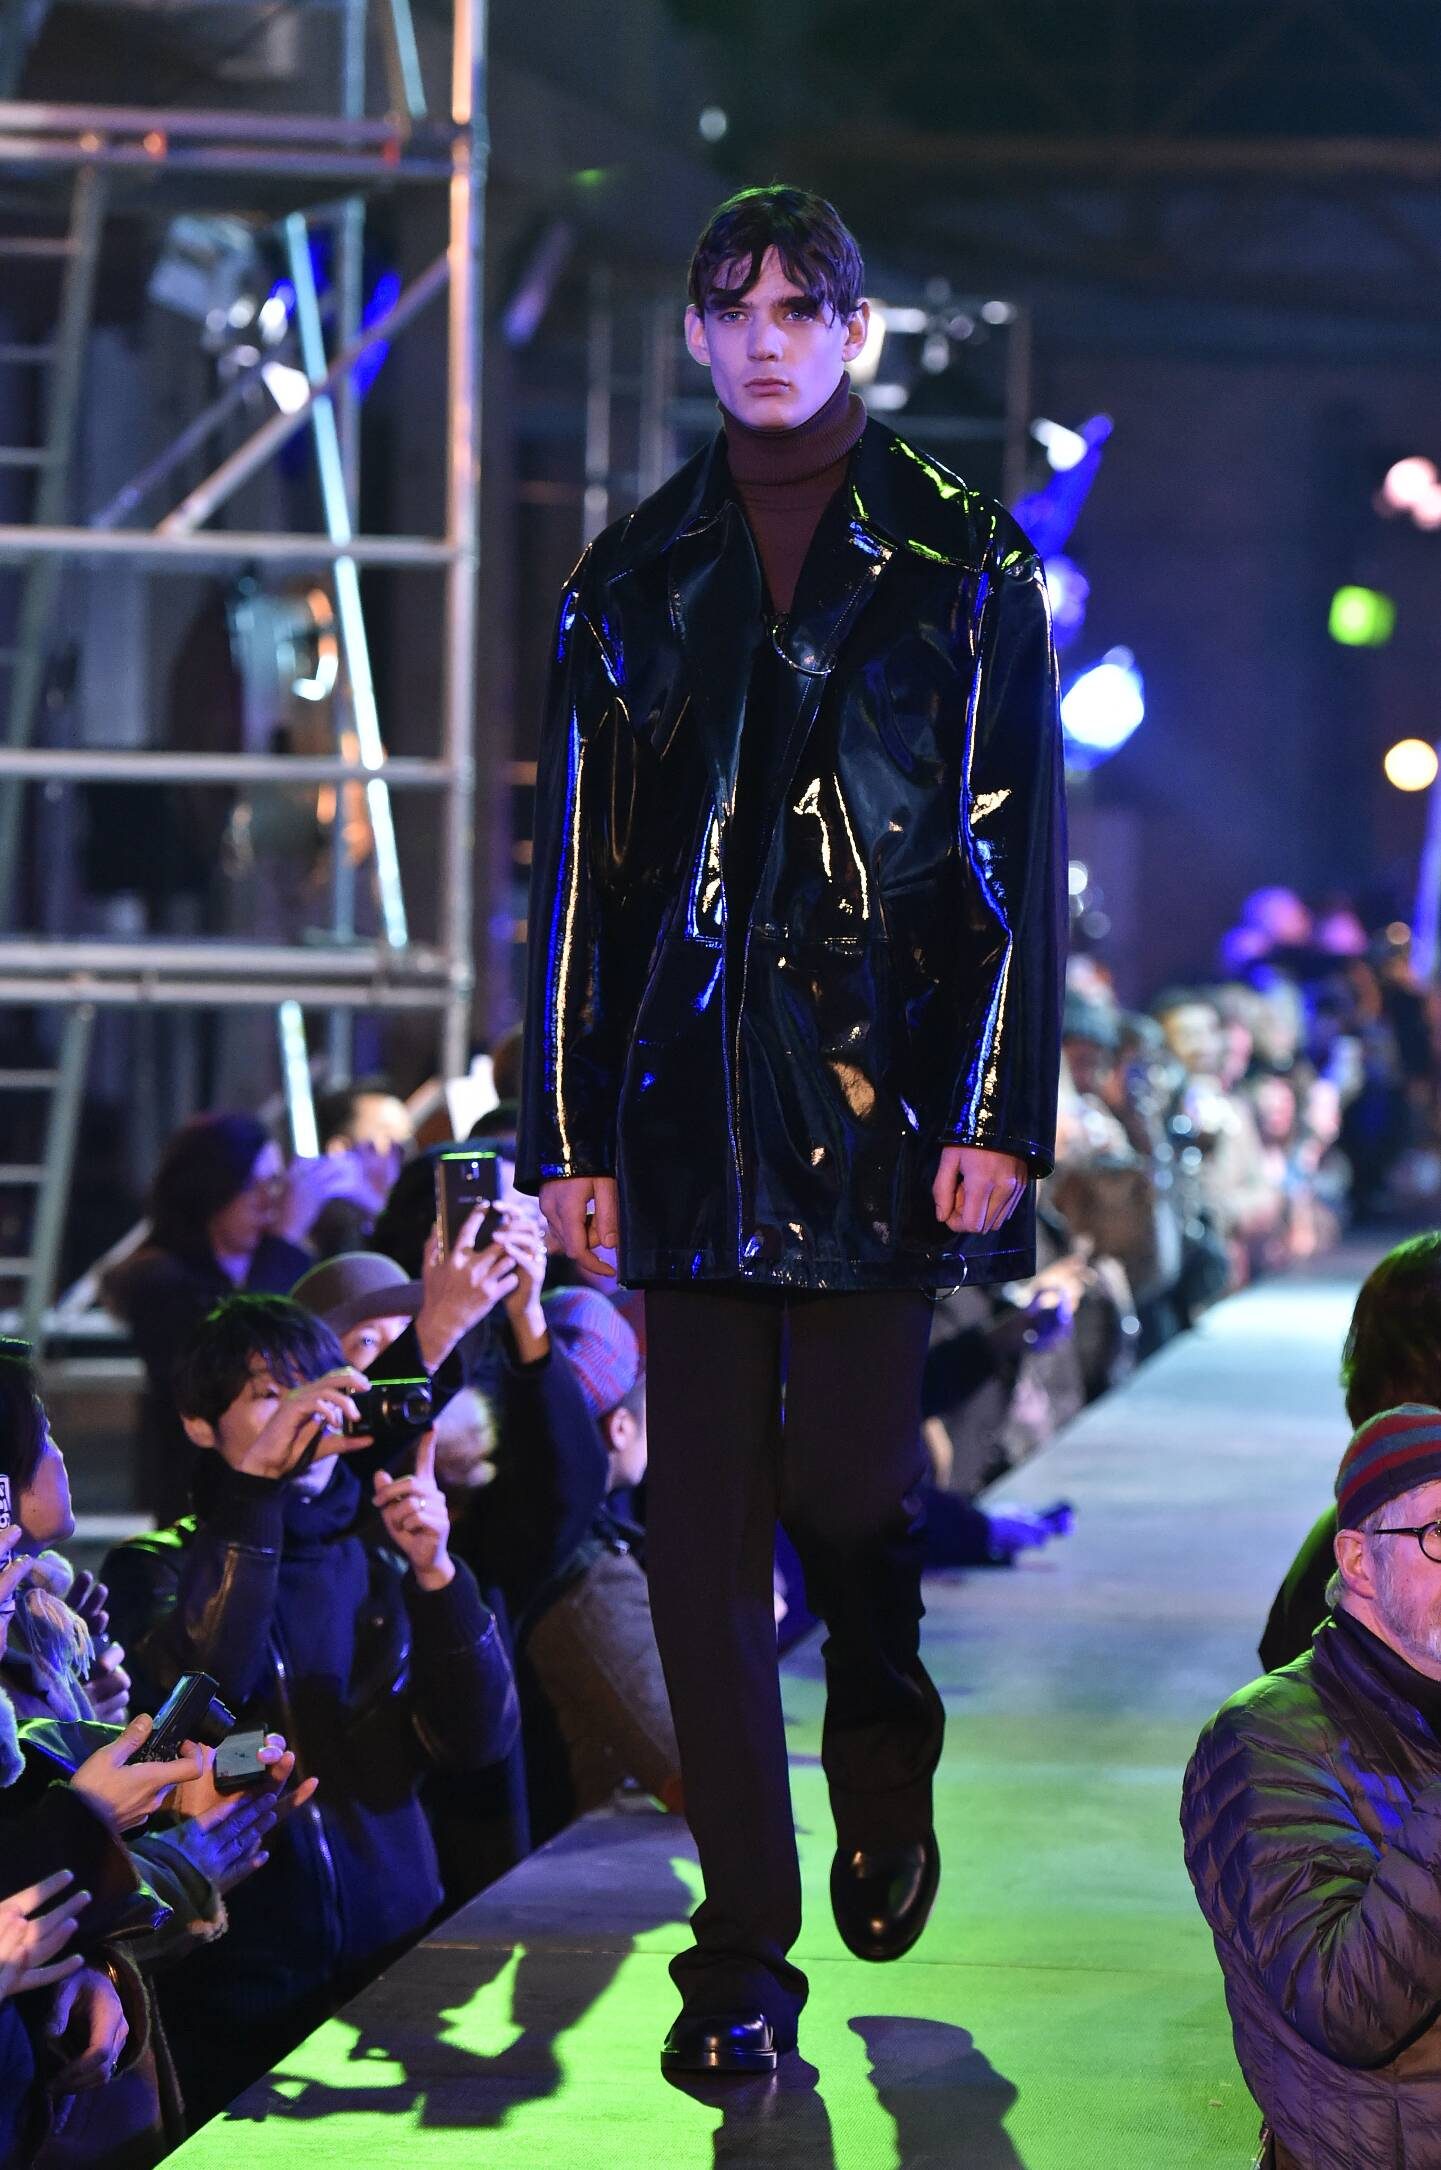 Catwalk Raf Simons Fall Winter 2015 16 Men's Collection Paris Fashion Week